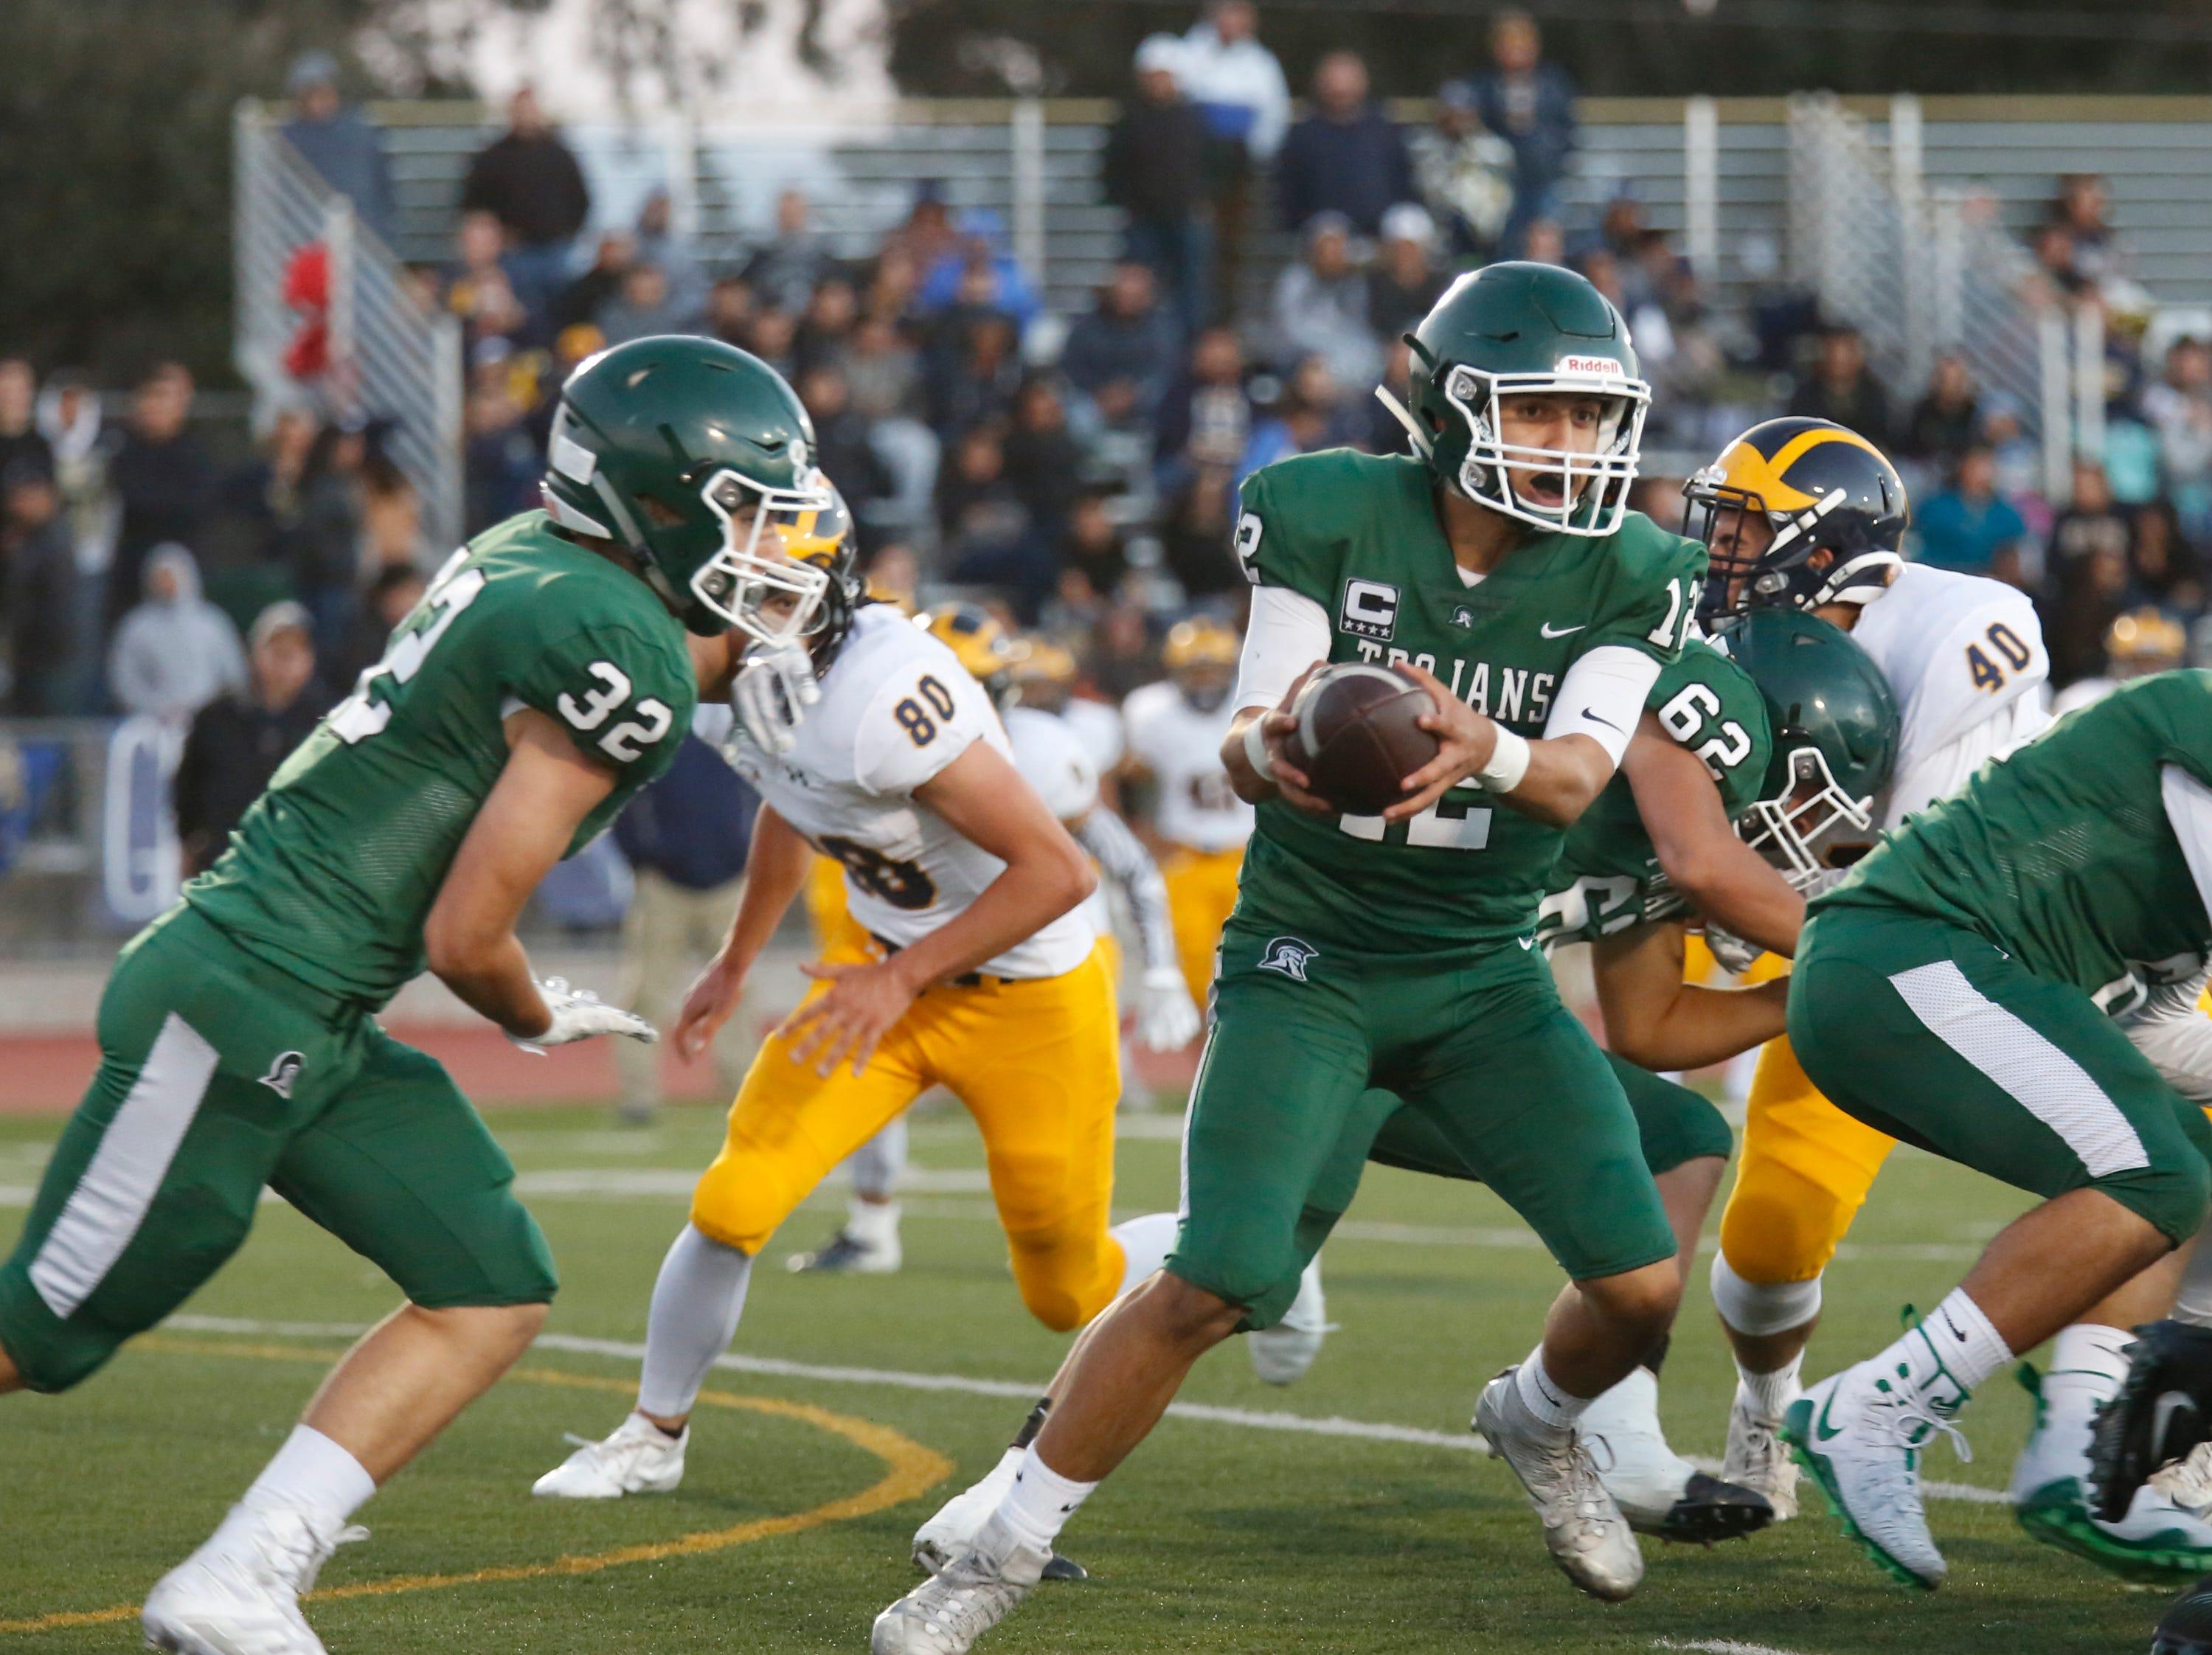 Alisal's quarterback Julian Renteria hands off to Dorian Segovia against Everett Alvarez during football at Alisal High School in Salinas on Friday August 31, 2018. (Photo By David Royal)